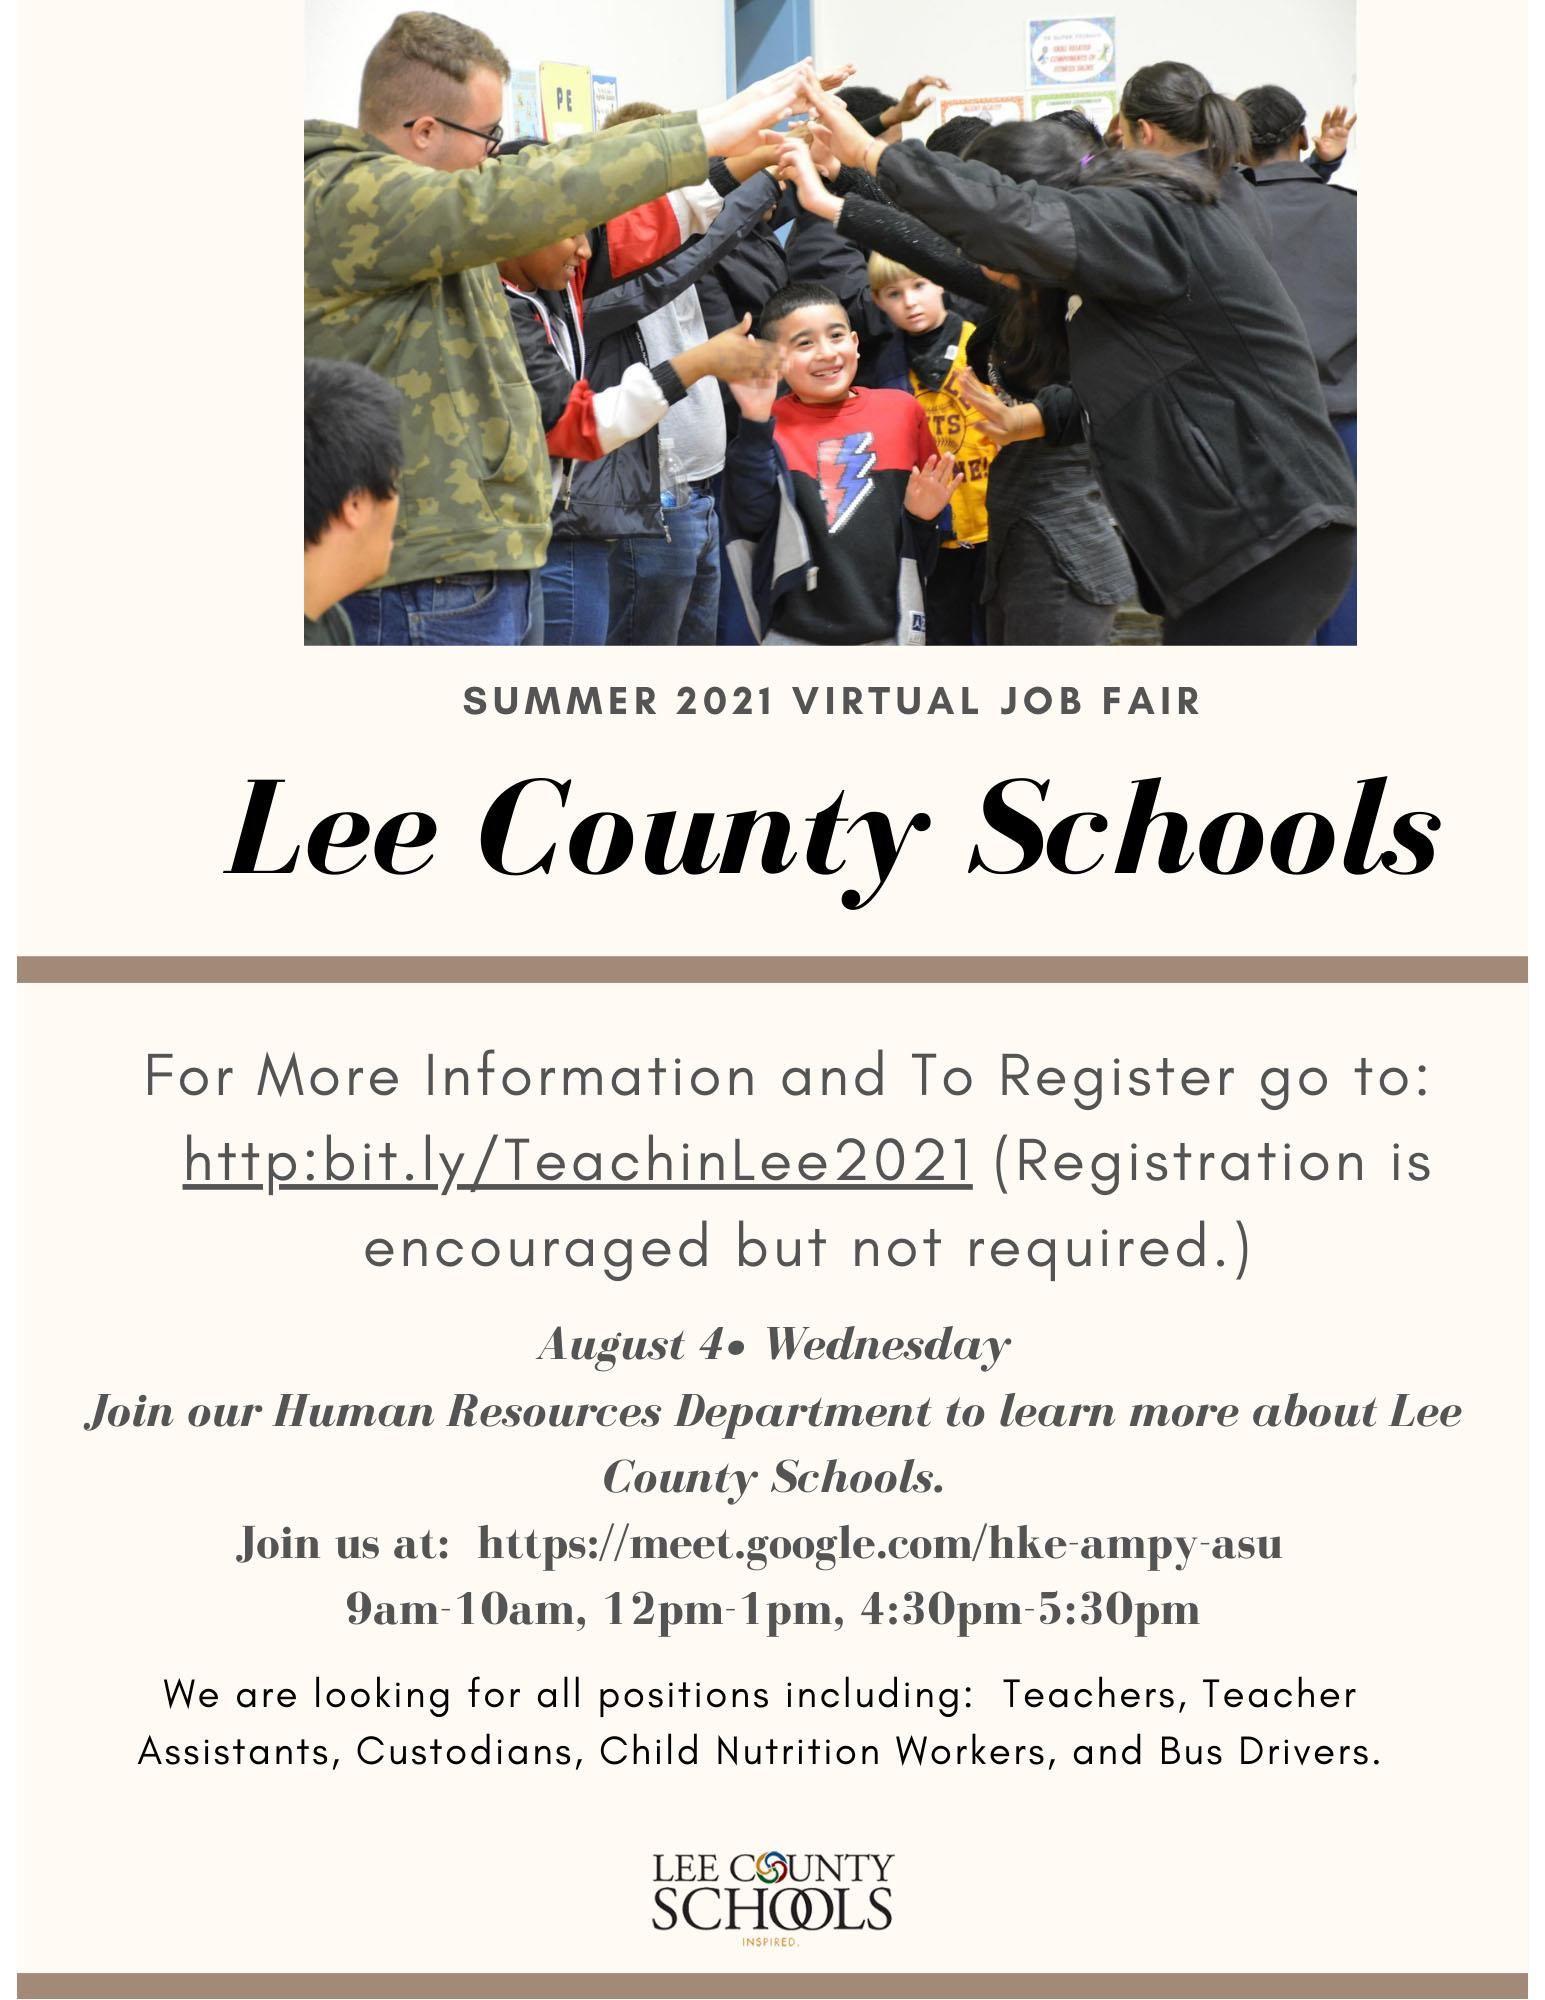 Lee County Schools' Summer 2021 Virtual Job Fair is August 4.